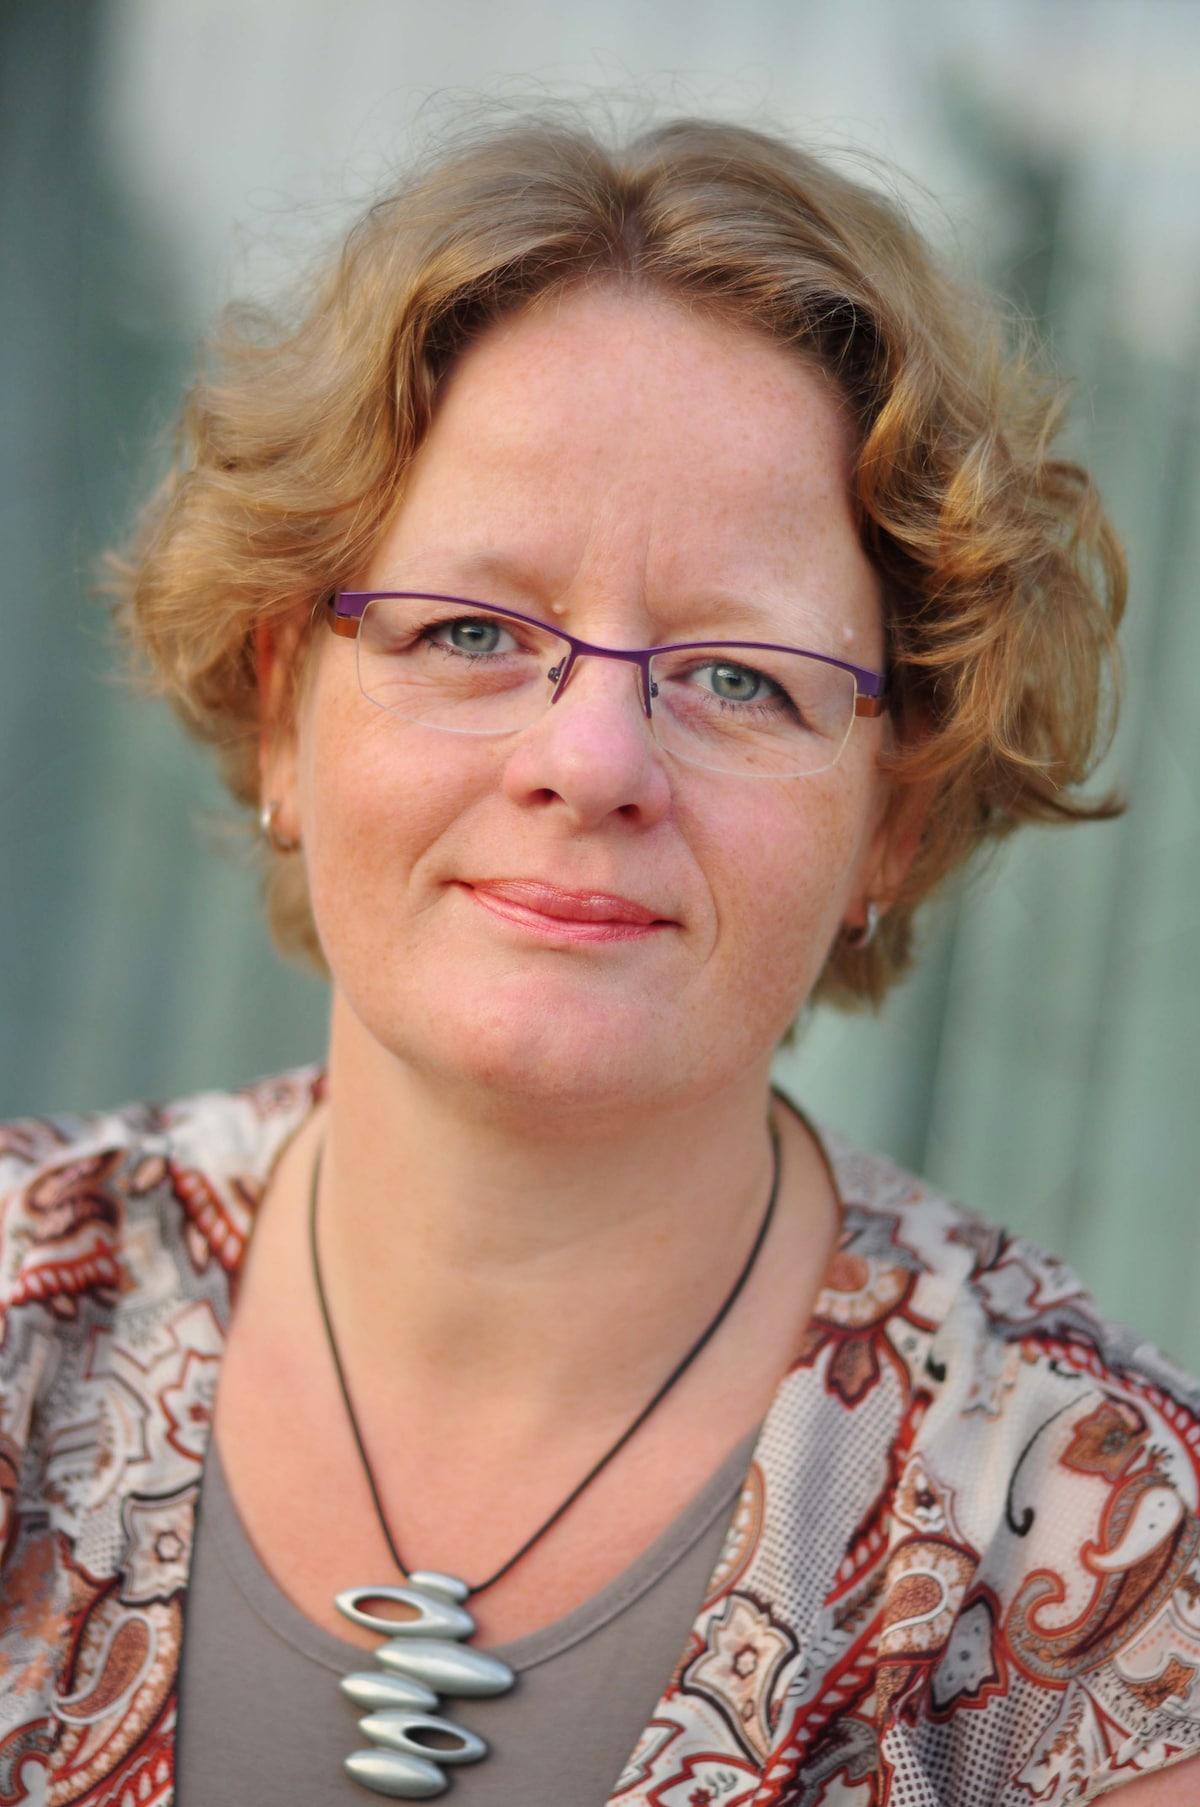 Gerda from Utrecht